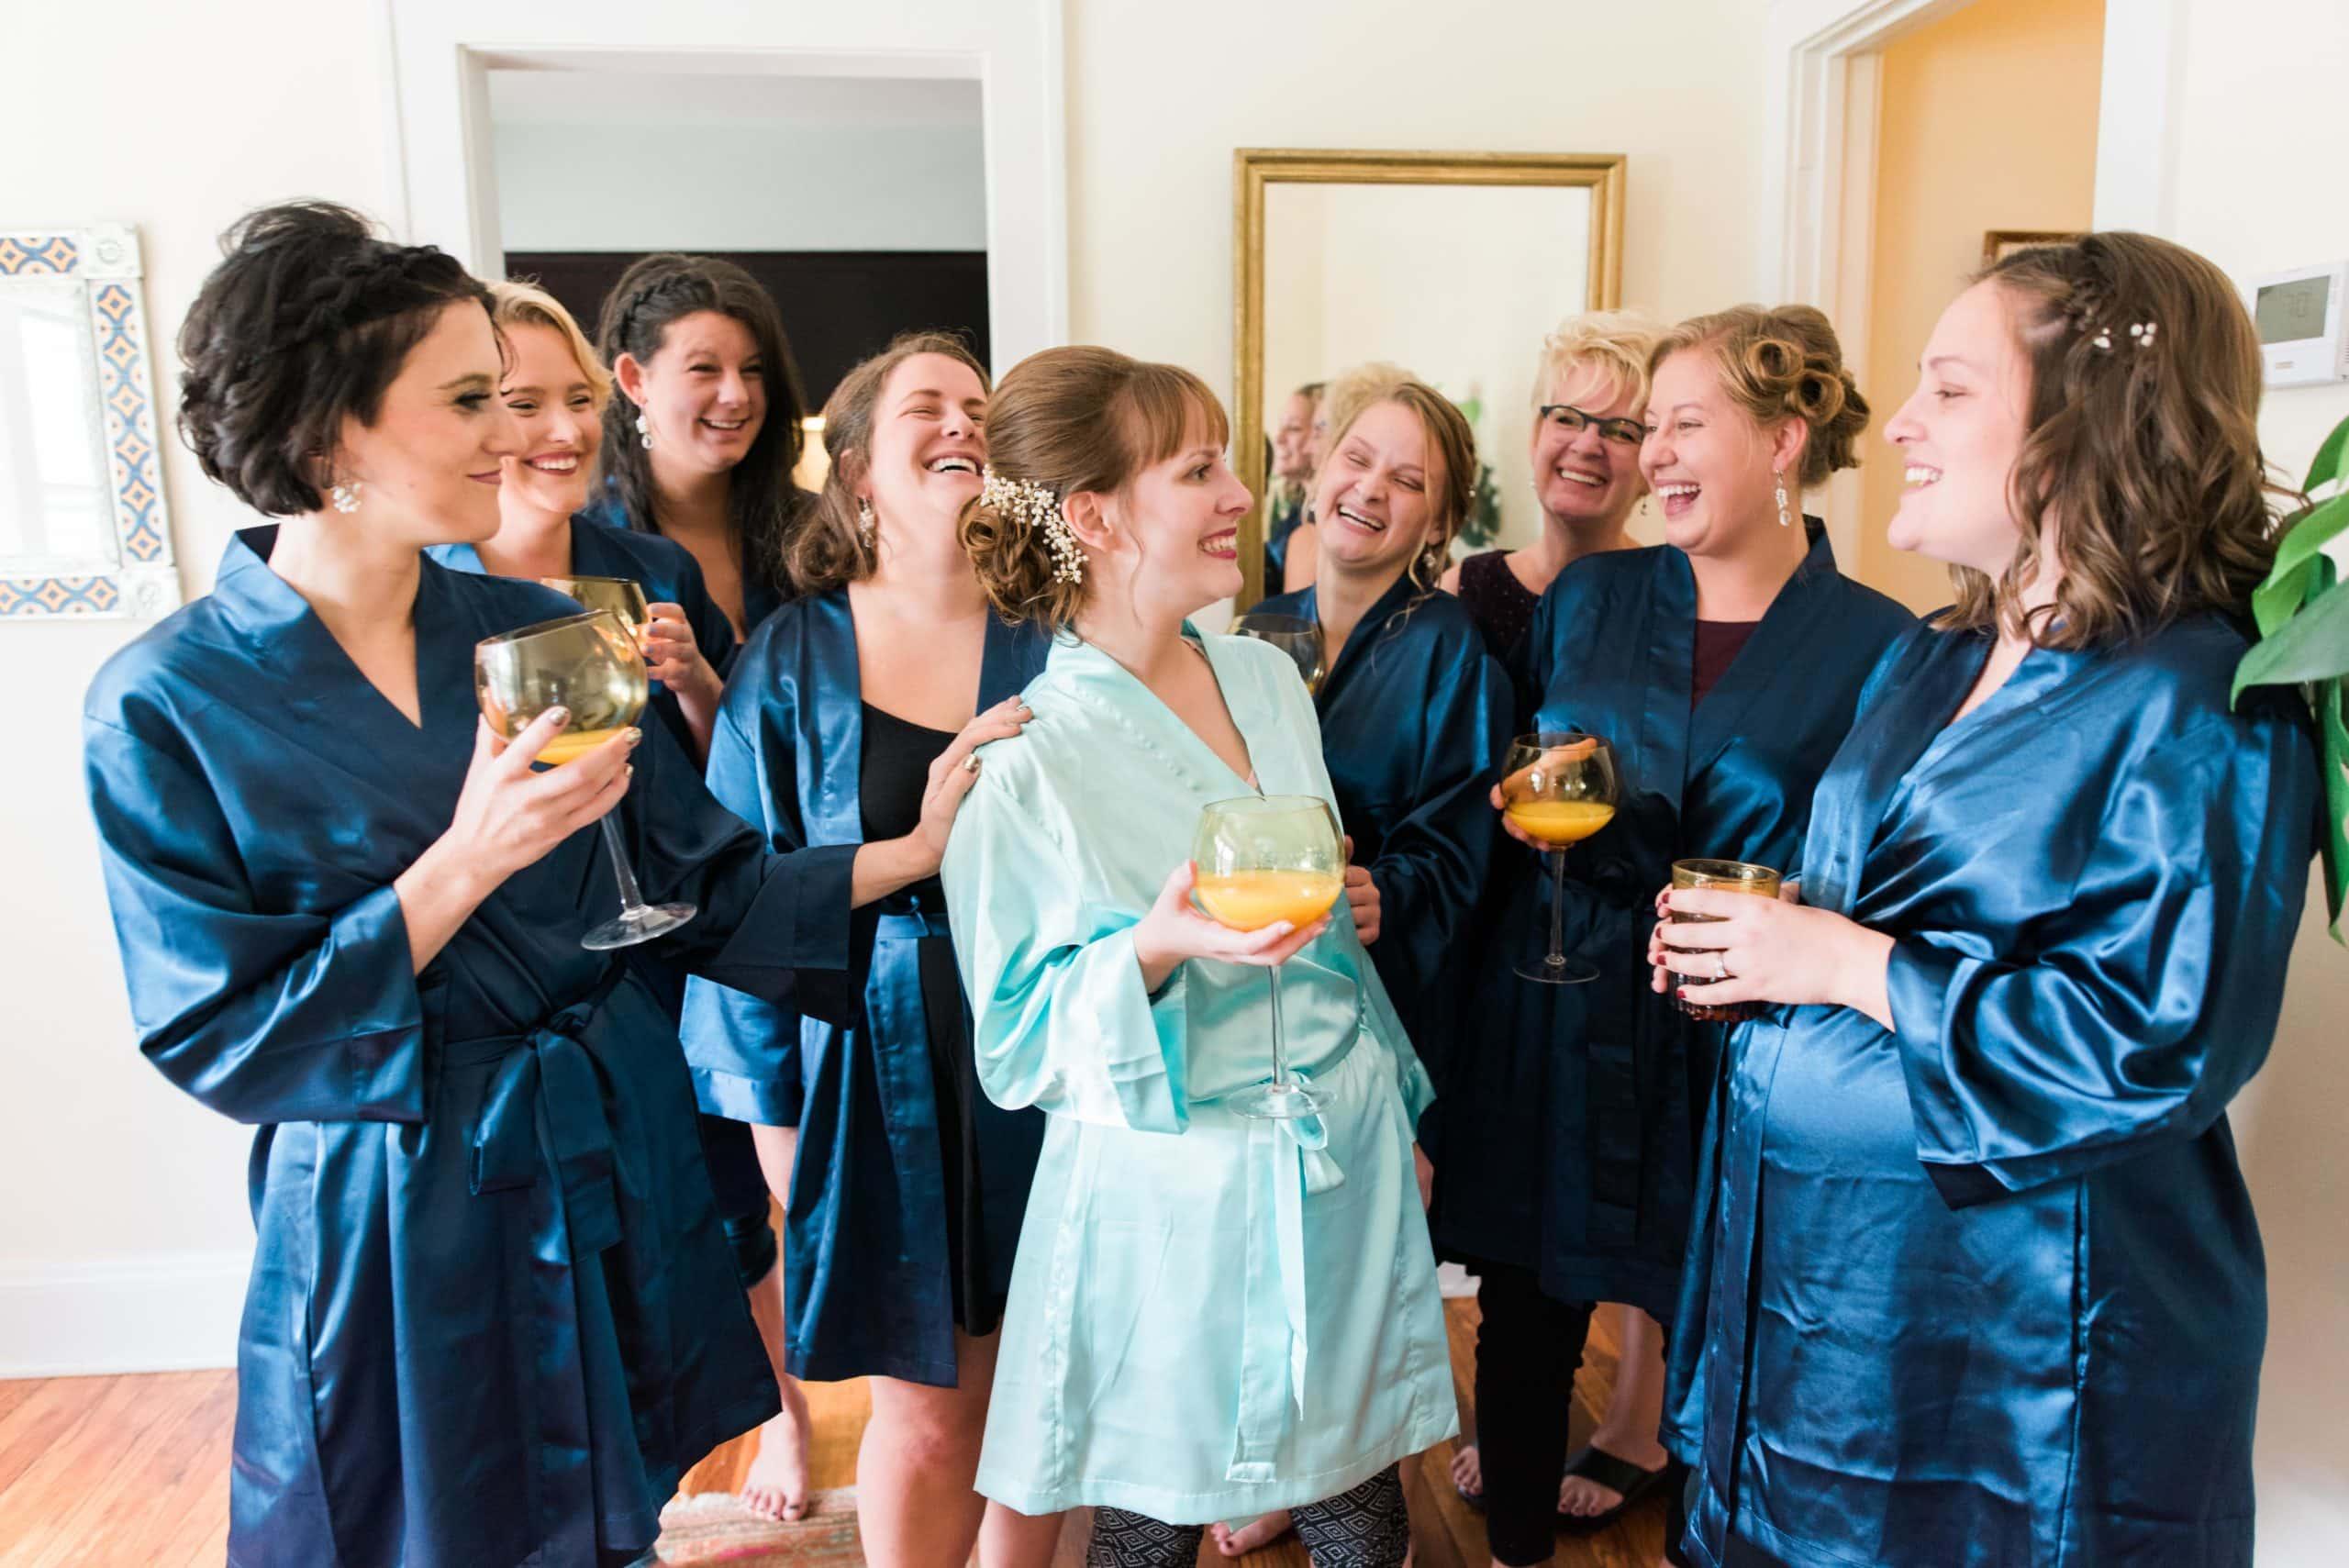 Bride & bridesmaid wearing navy blue robes